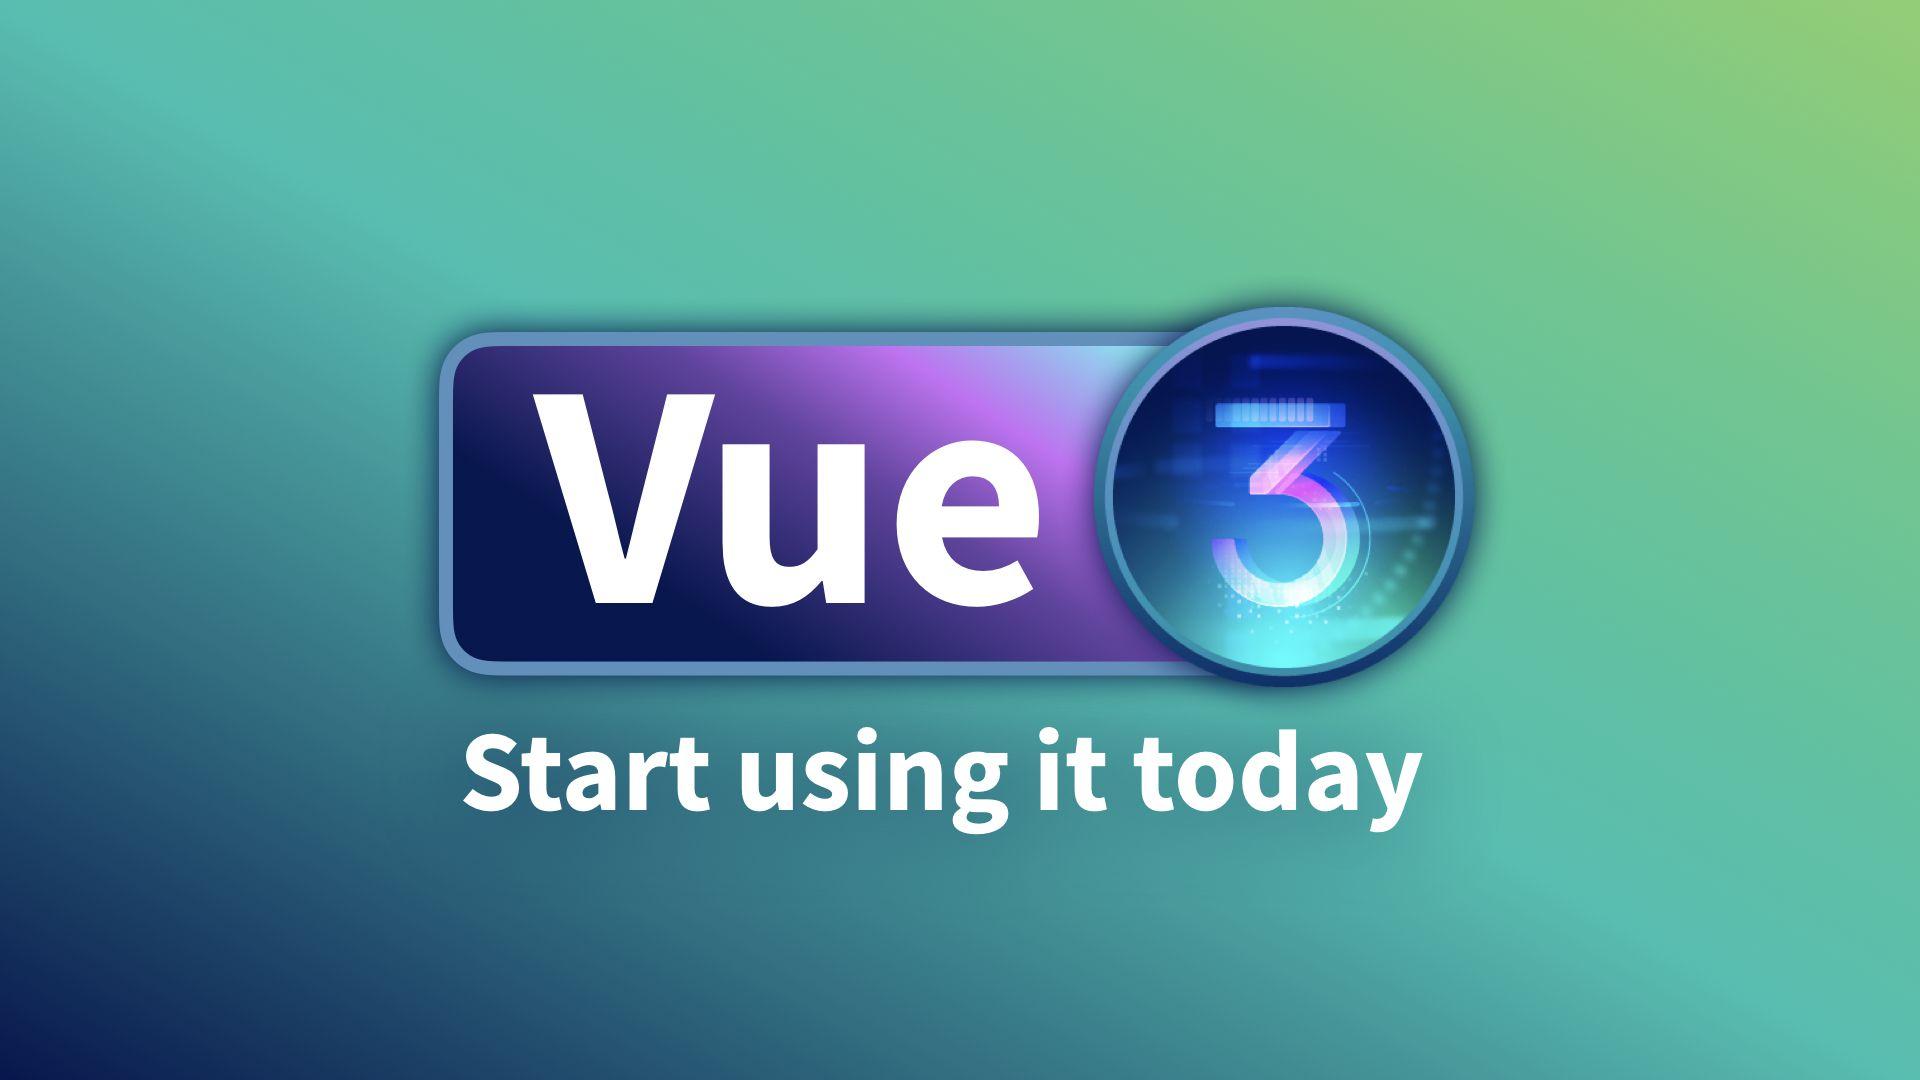 Vue 3: Start Using it Today